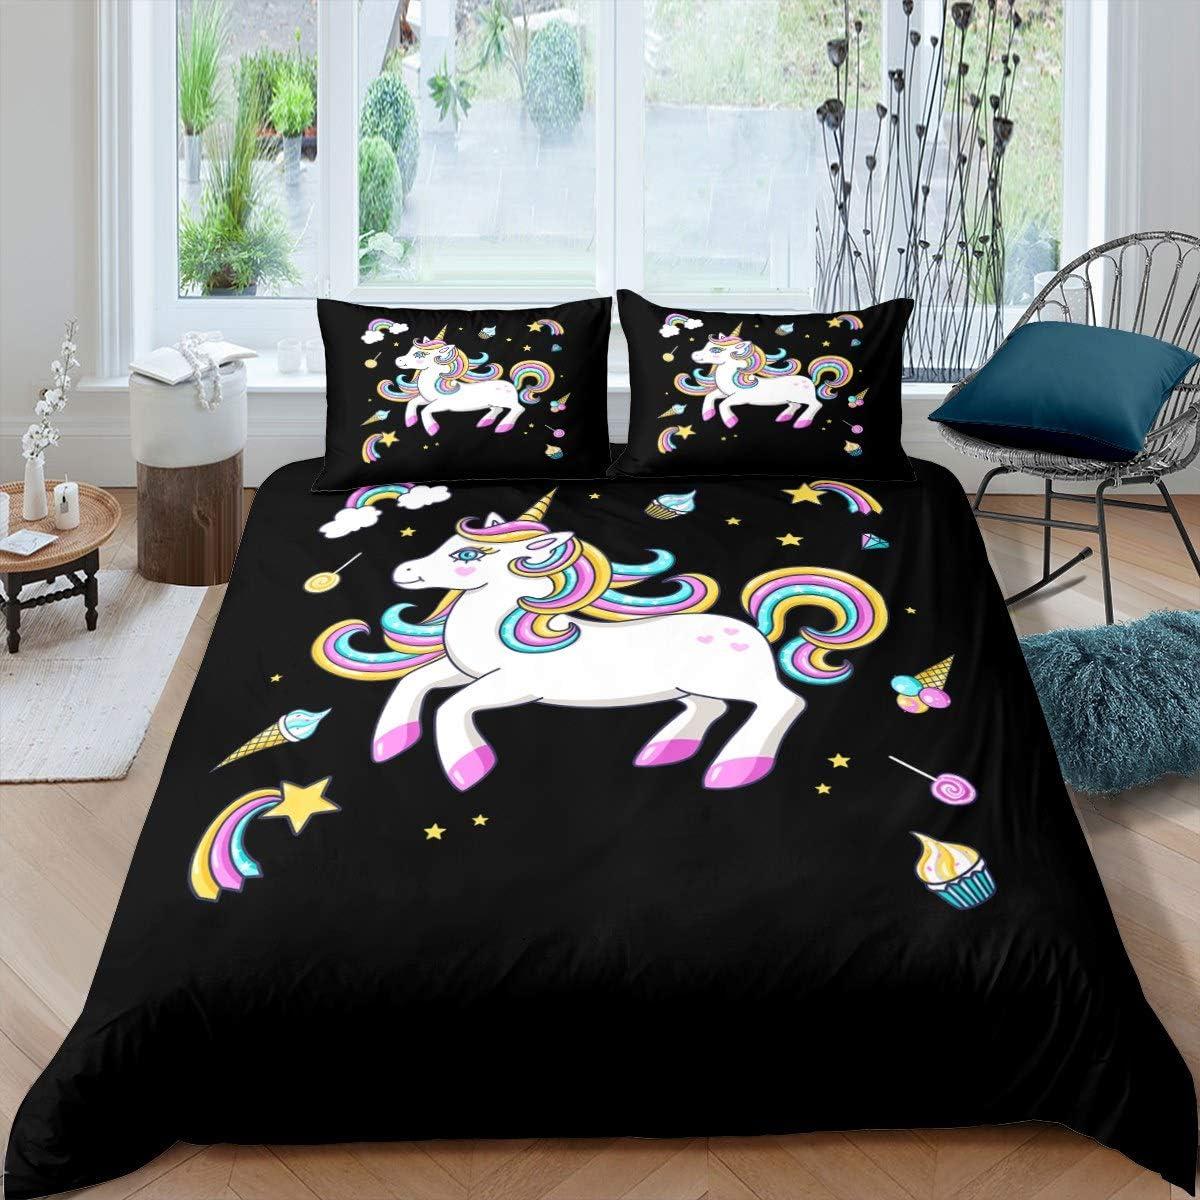 Feelyou Unicorn Save money Duvet Cover Girly Set Magic Horse Many popular brands Dreamy Bedding